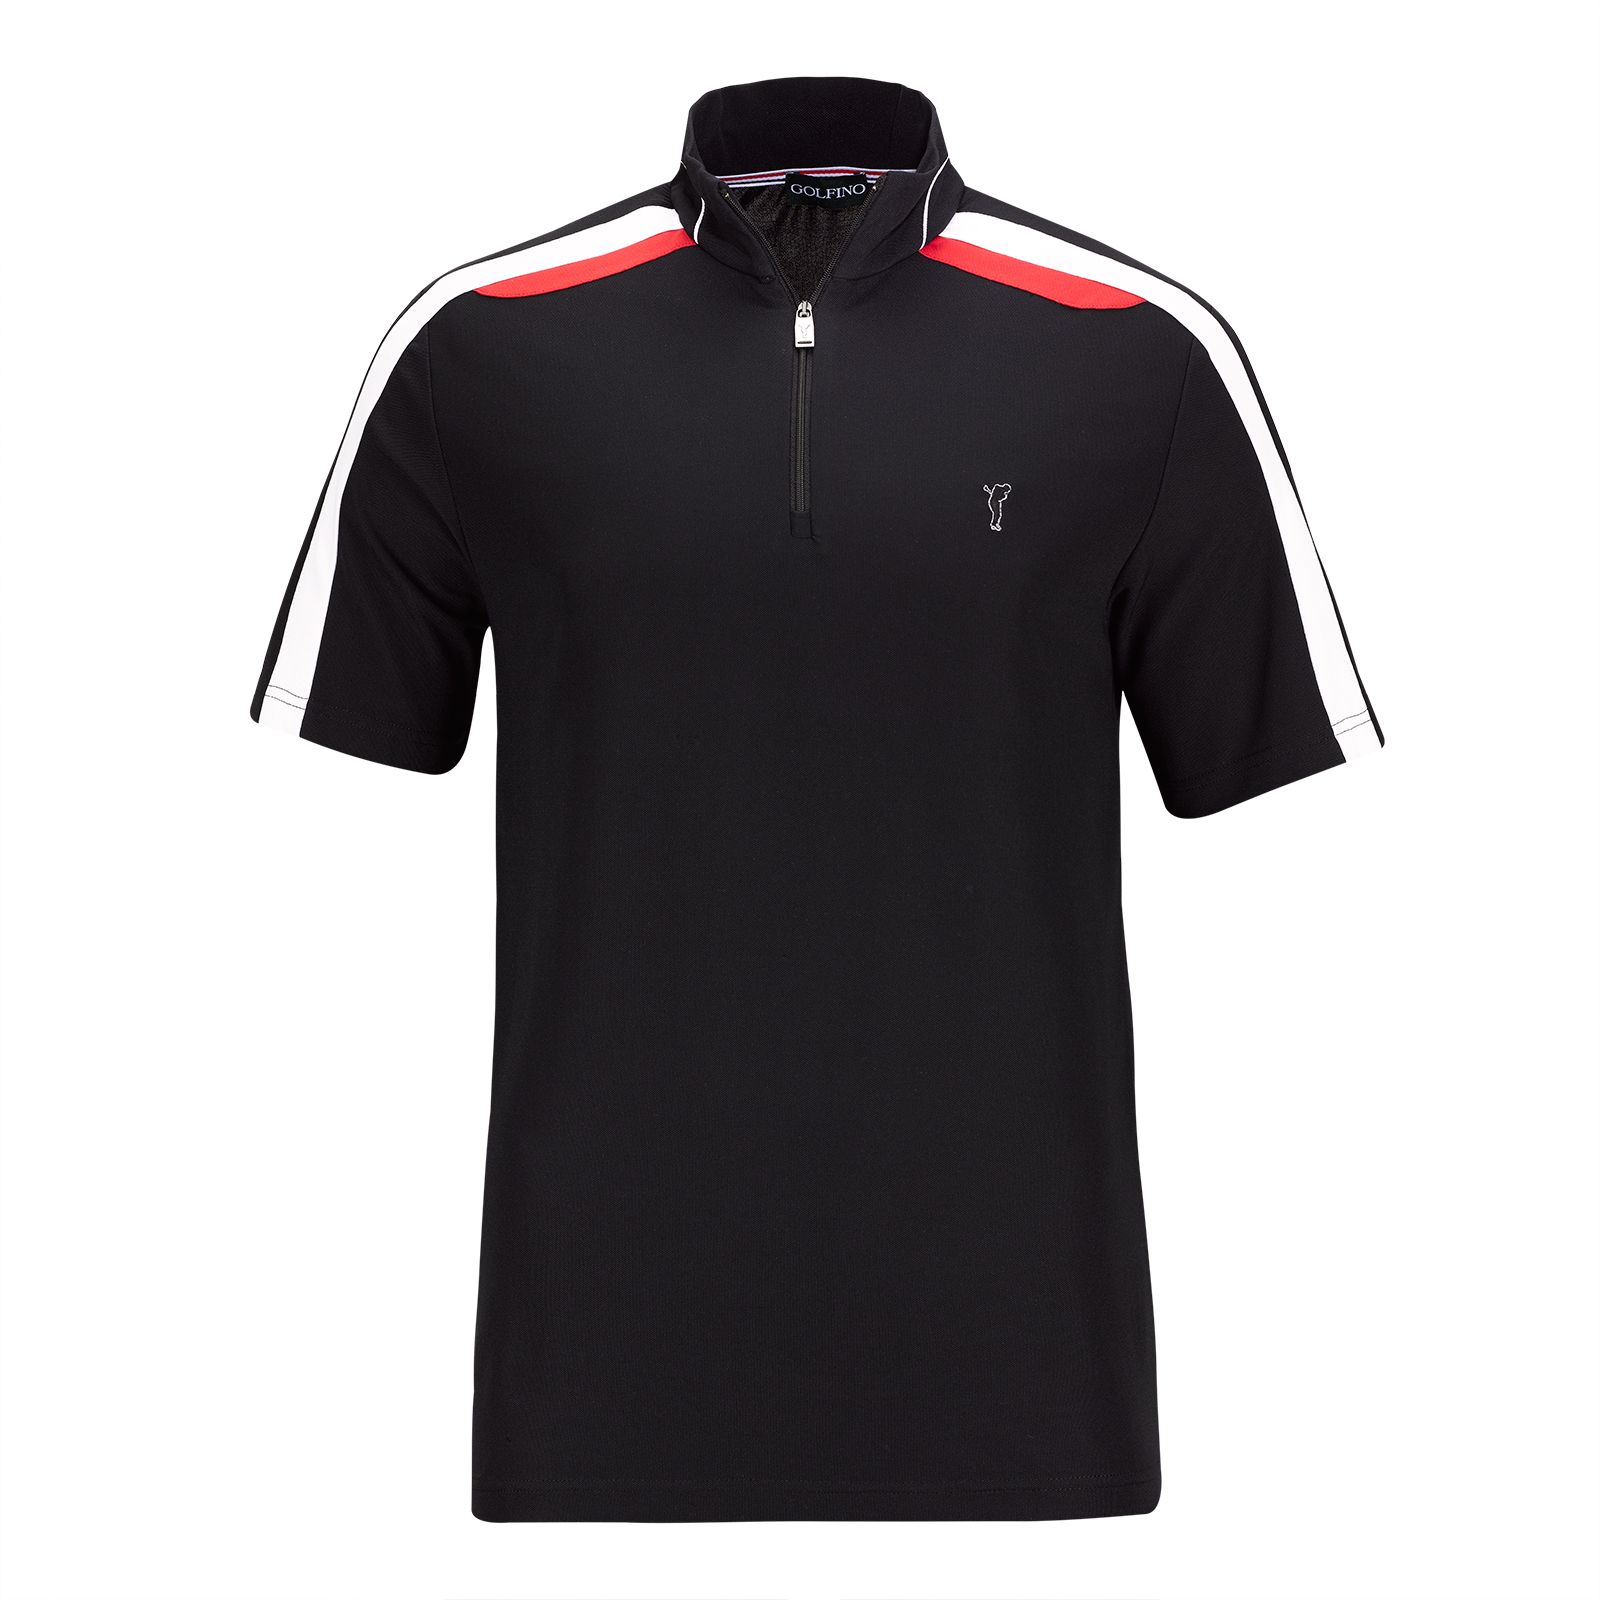 Herren Kurzarm Performance Golf-Troyer Extra Dry im Pro Look